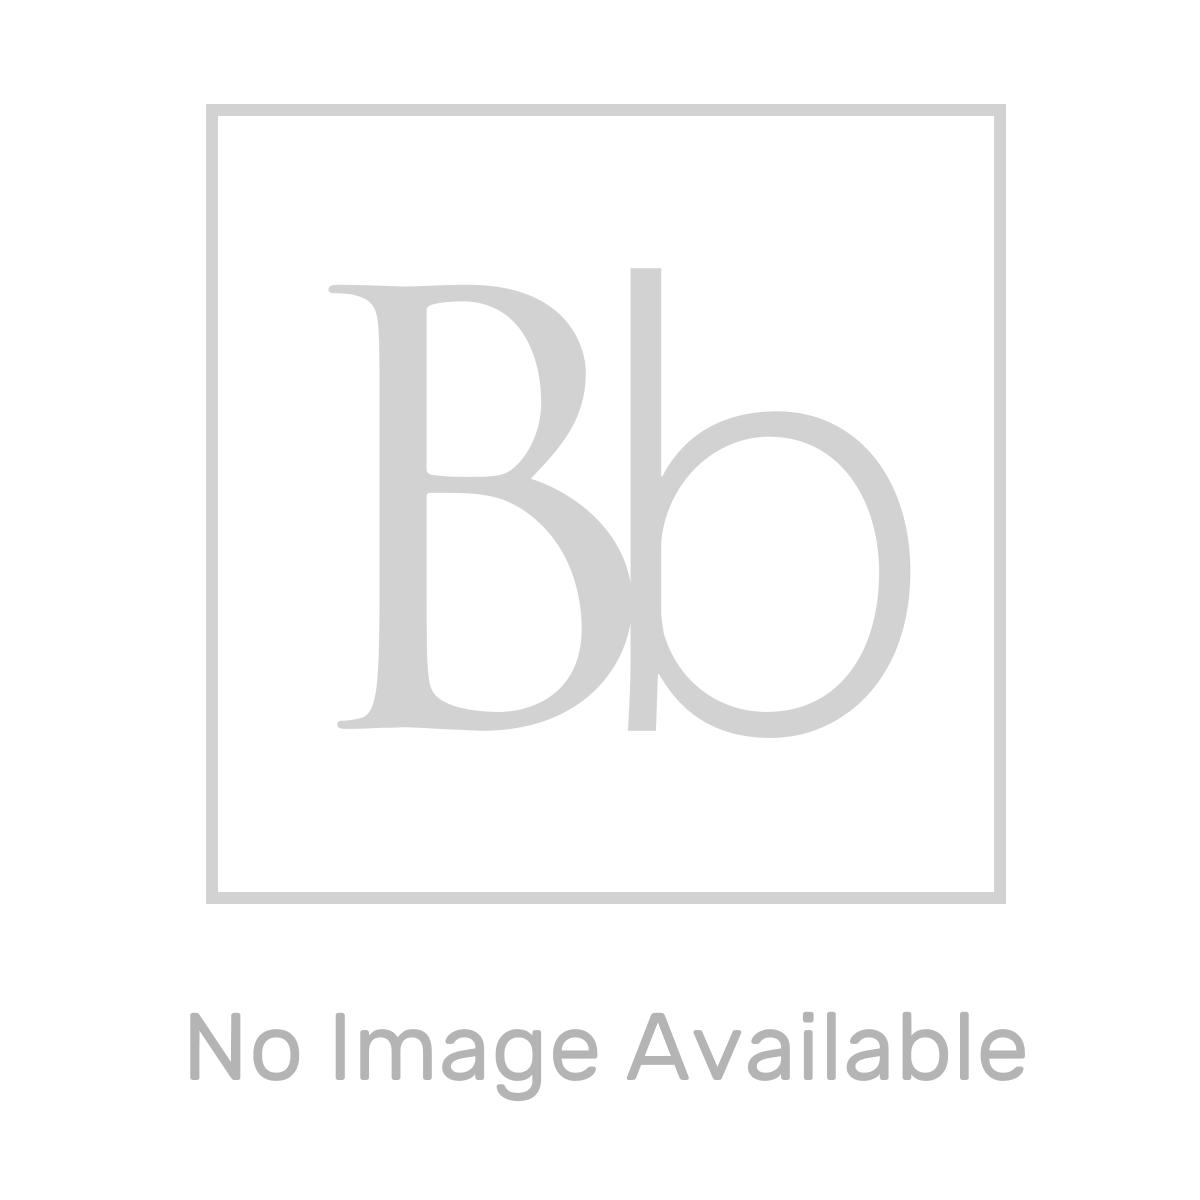 Bathrooms To Love RefleXion Flex Sliding Shower Door with Optional Side Panel 1